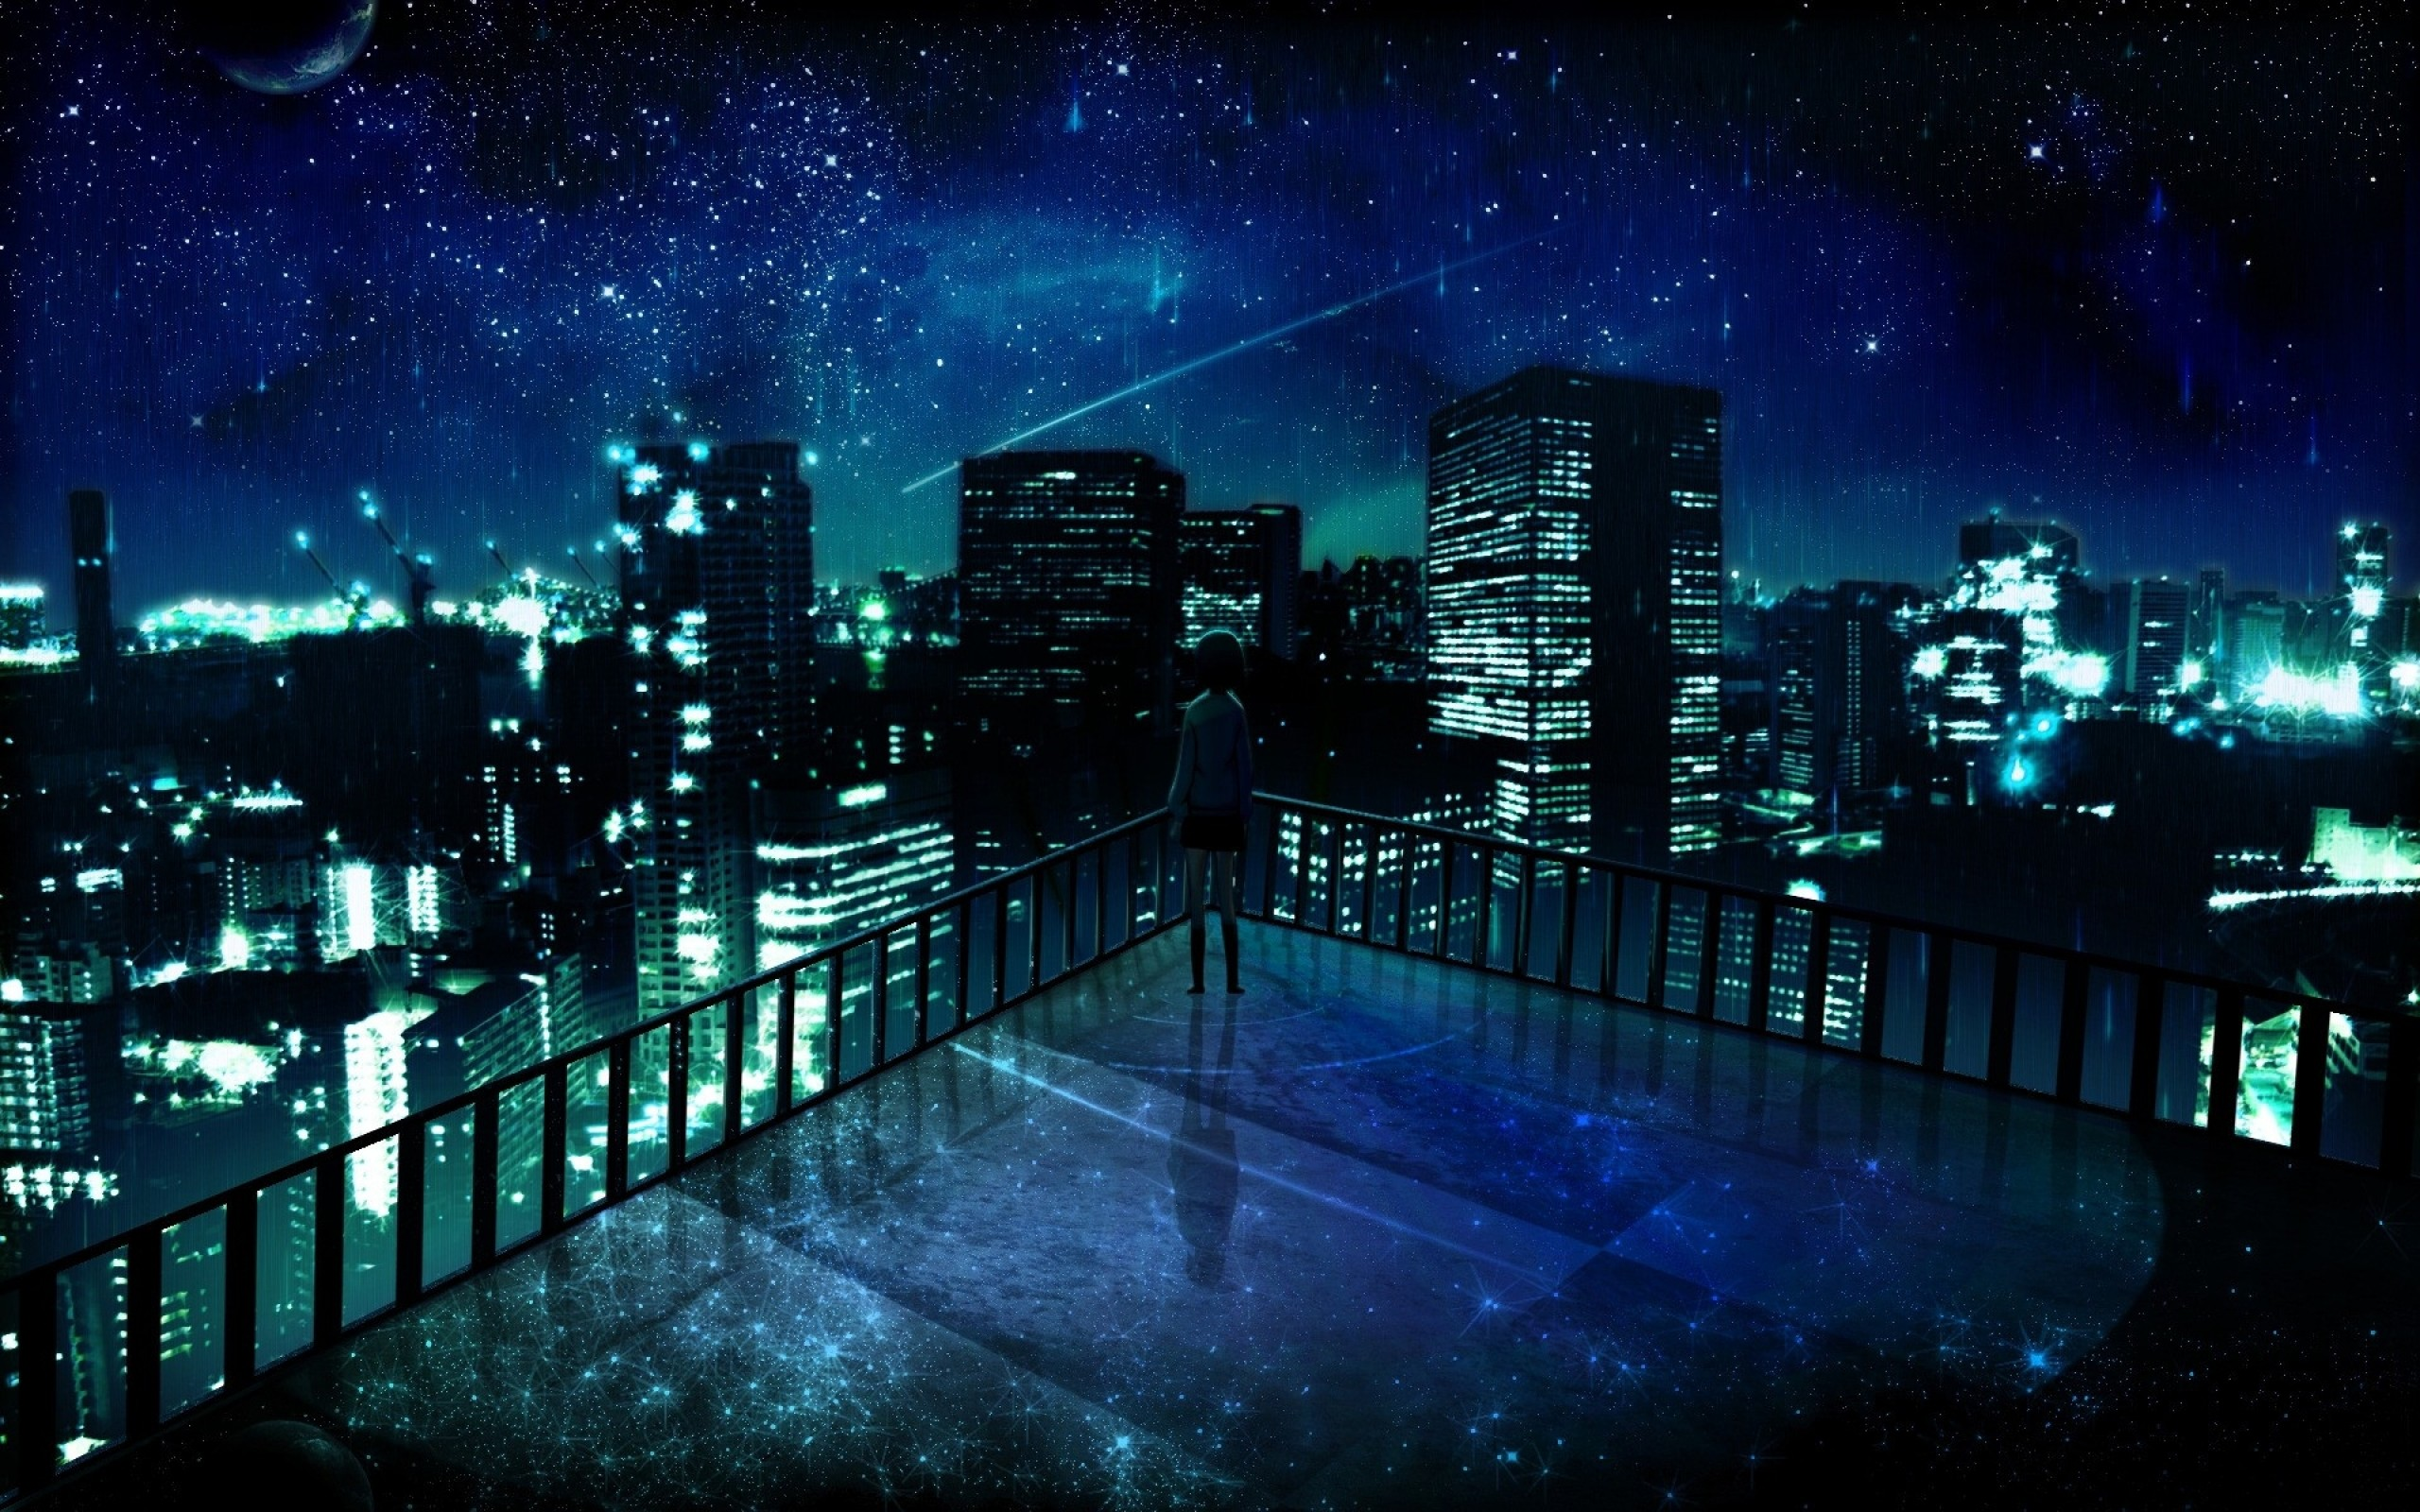 Anime Scenery Rain Wallpaper 1080p